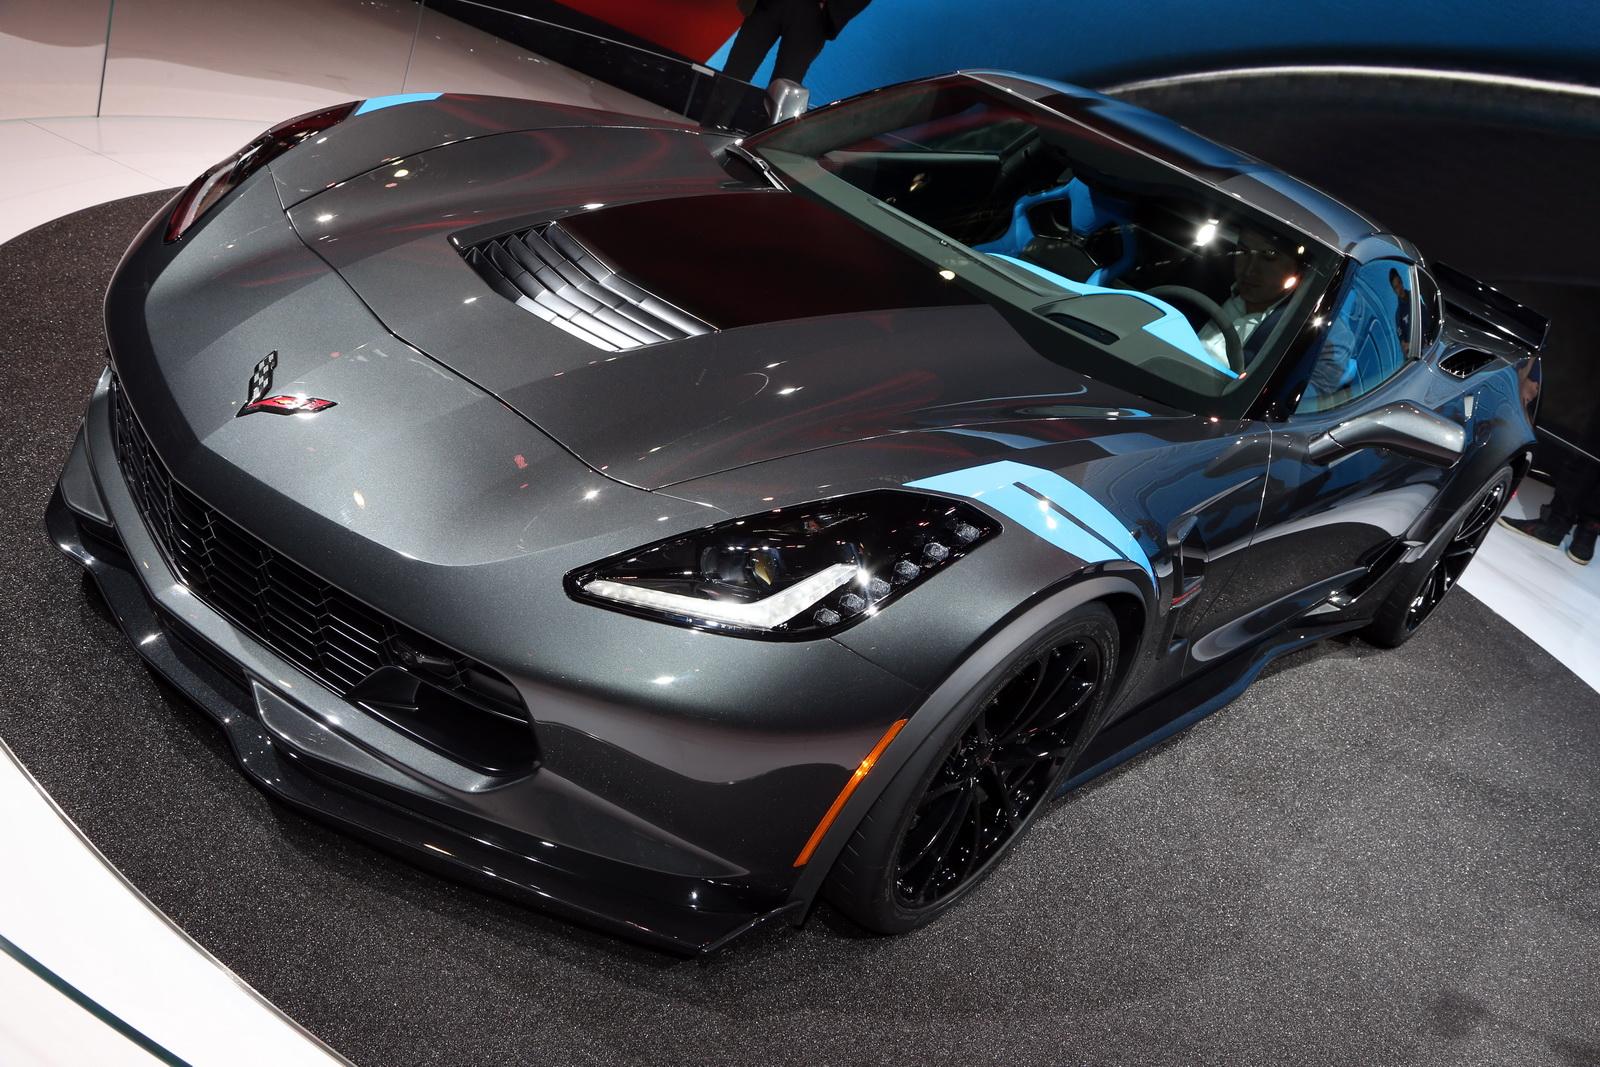 grand new avanza grey metallic all kijang innova 2.0 v a/t lux corvette sport is the hidden gem of geneva